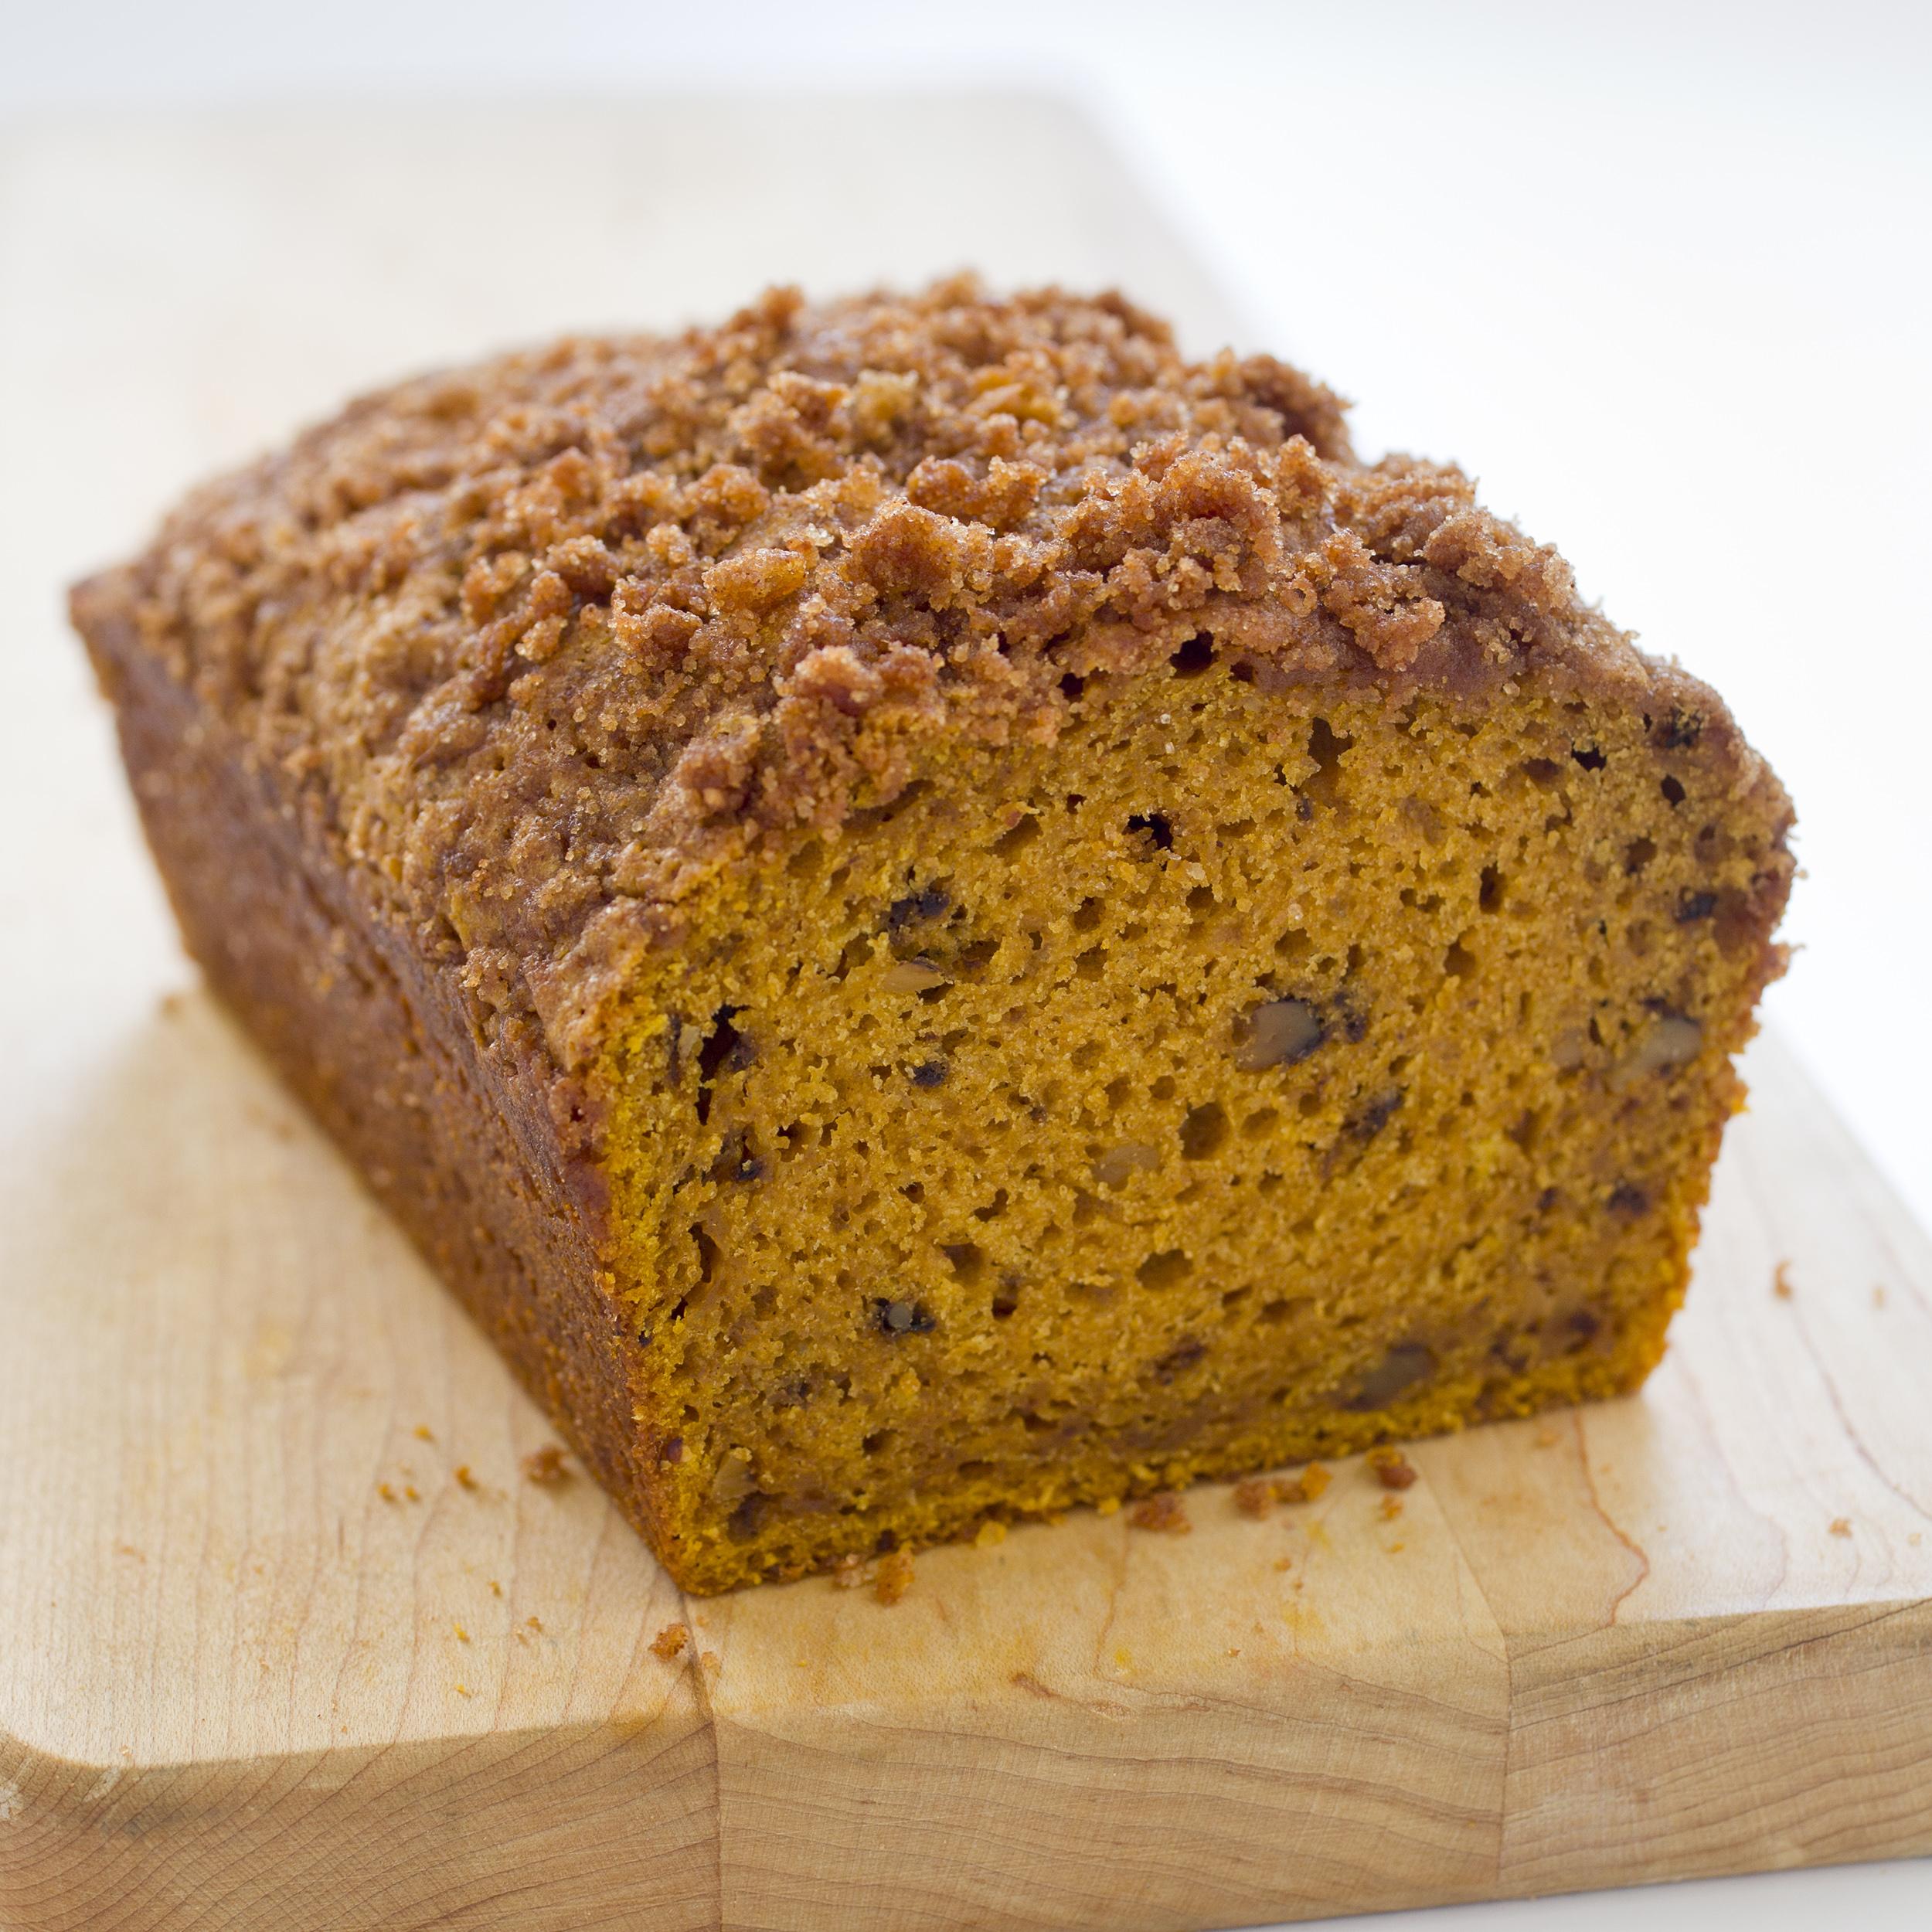 CVR_SFS_spiced_pumpkin_bread_CLR-9.jpg